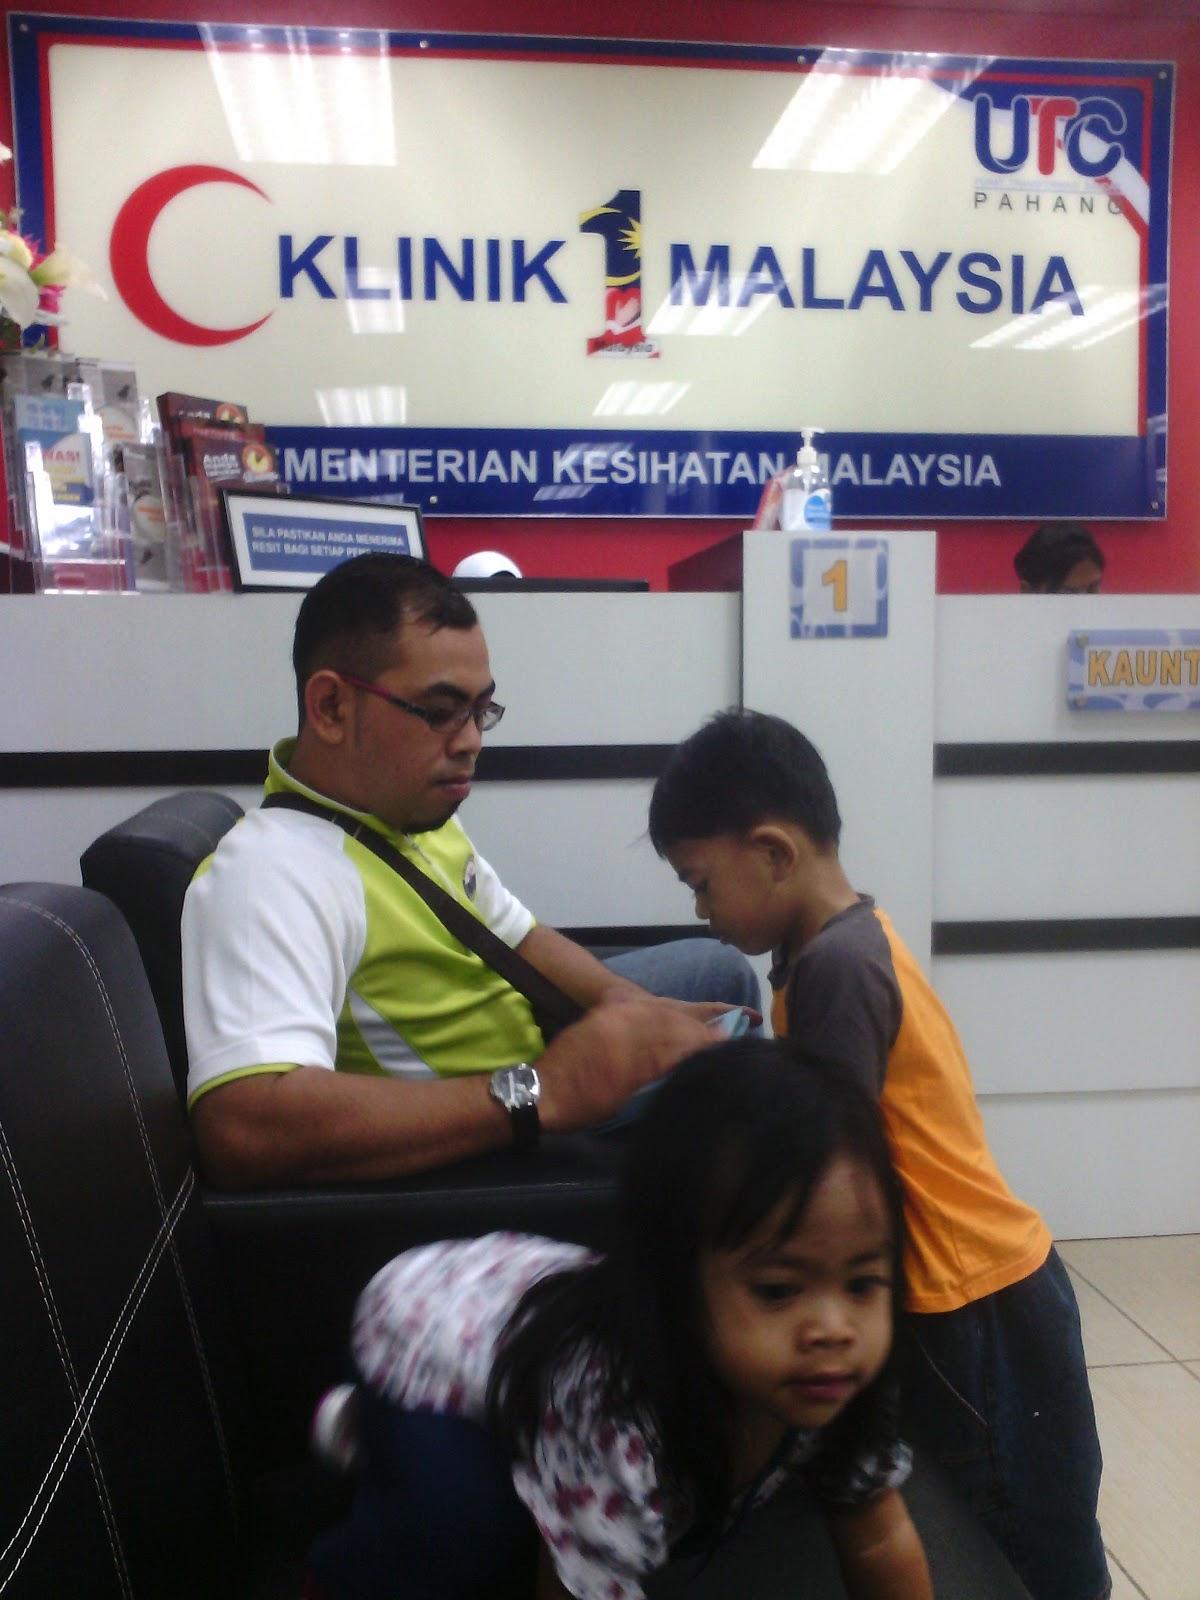 Klinik 1 Malaysia Utc Kuantan Cerita Ita